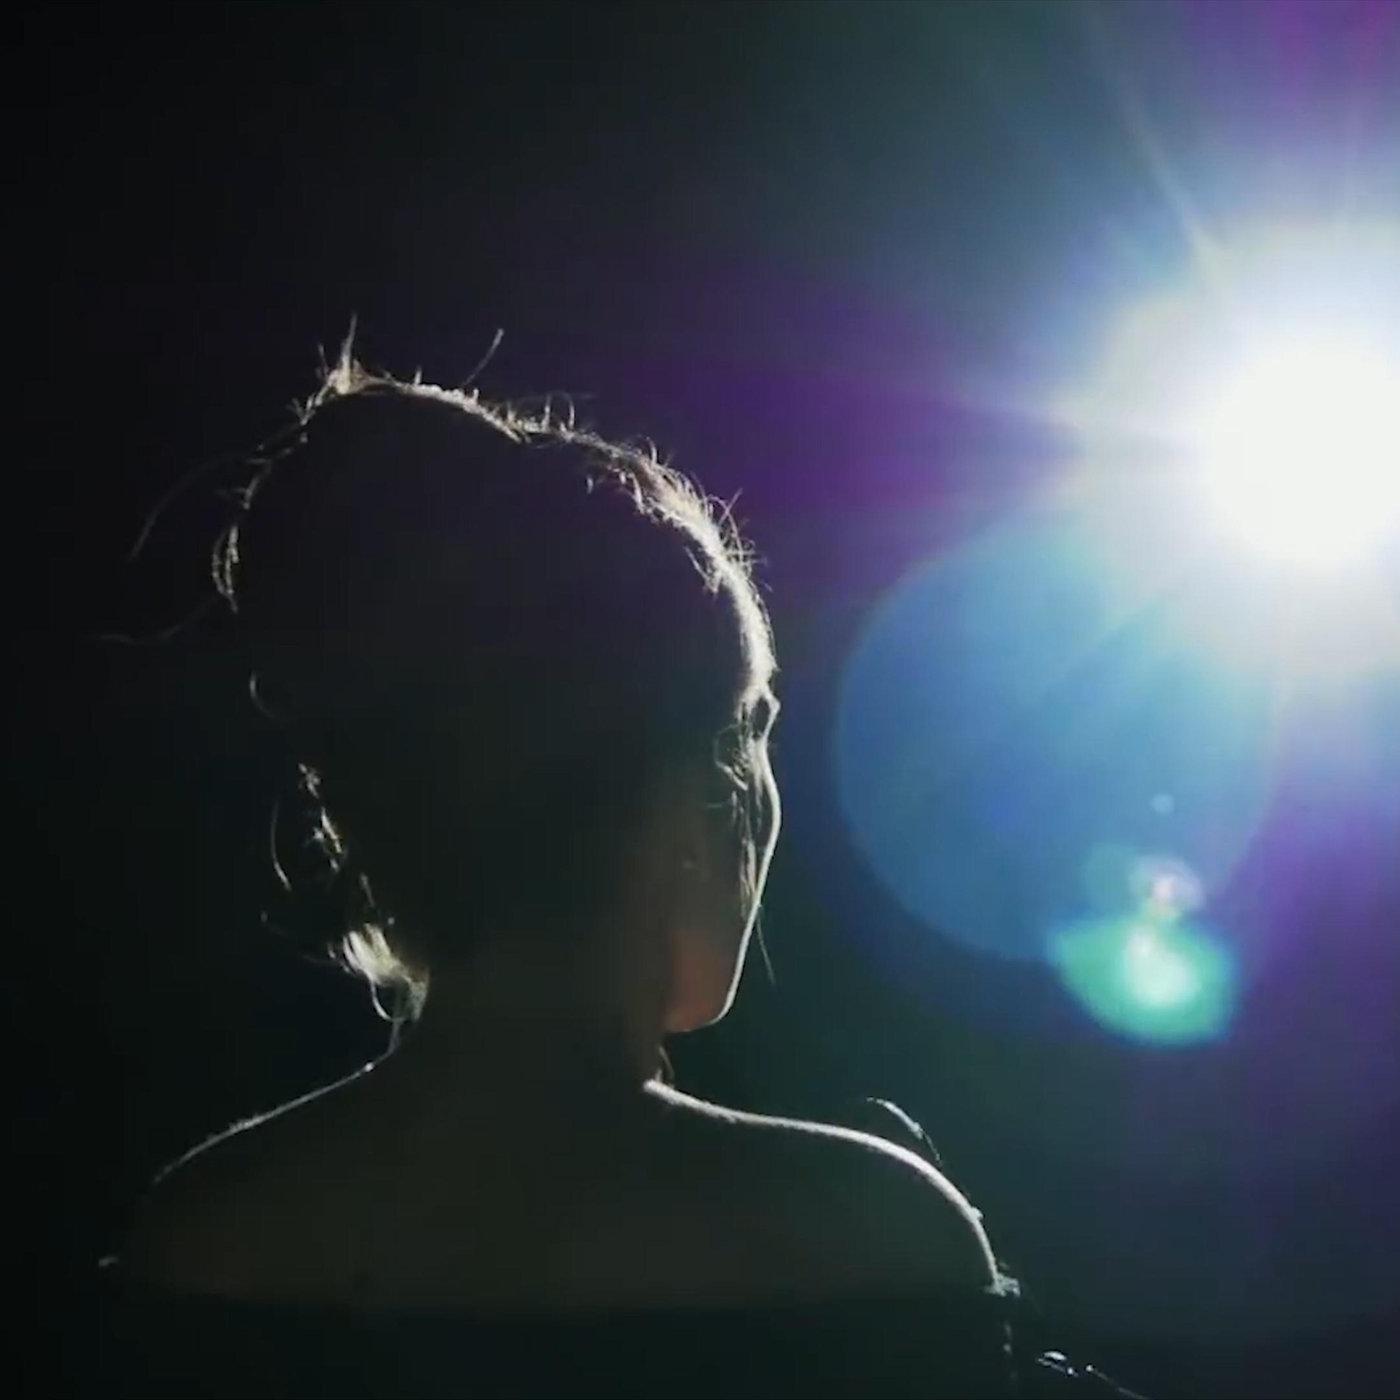 Pamelas Potentiale (1/2) - Zauber, Flöte, Deluxe - Opernstar in einem Tag